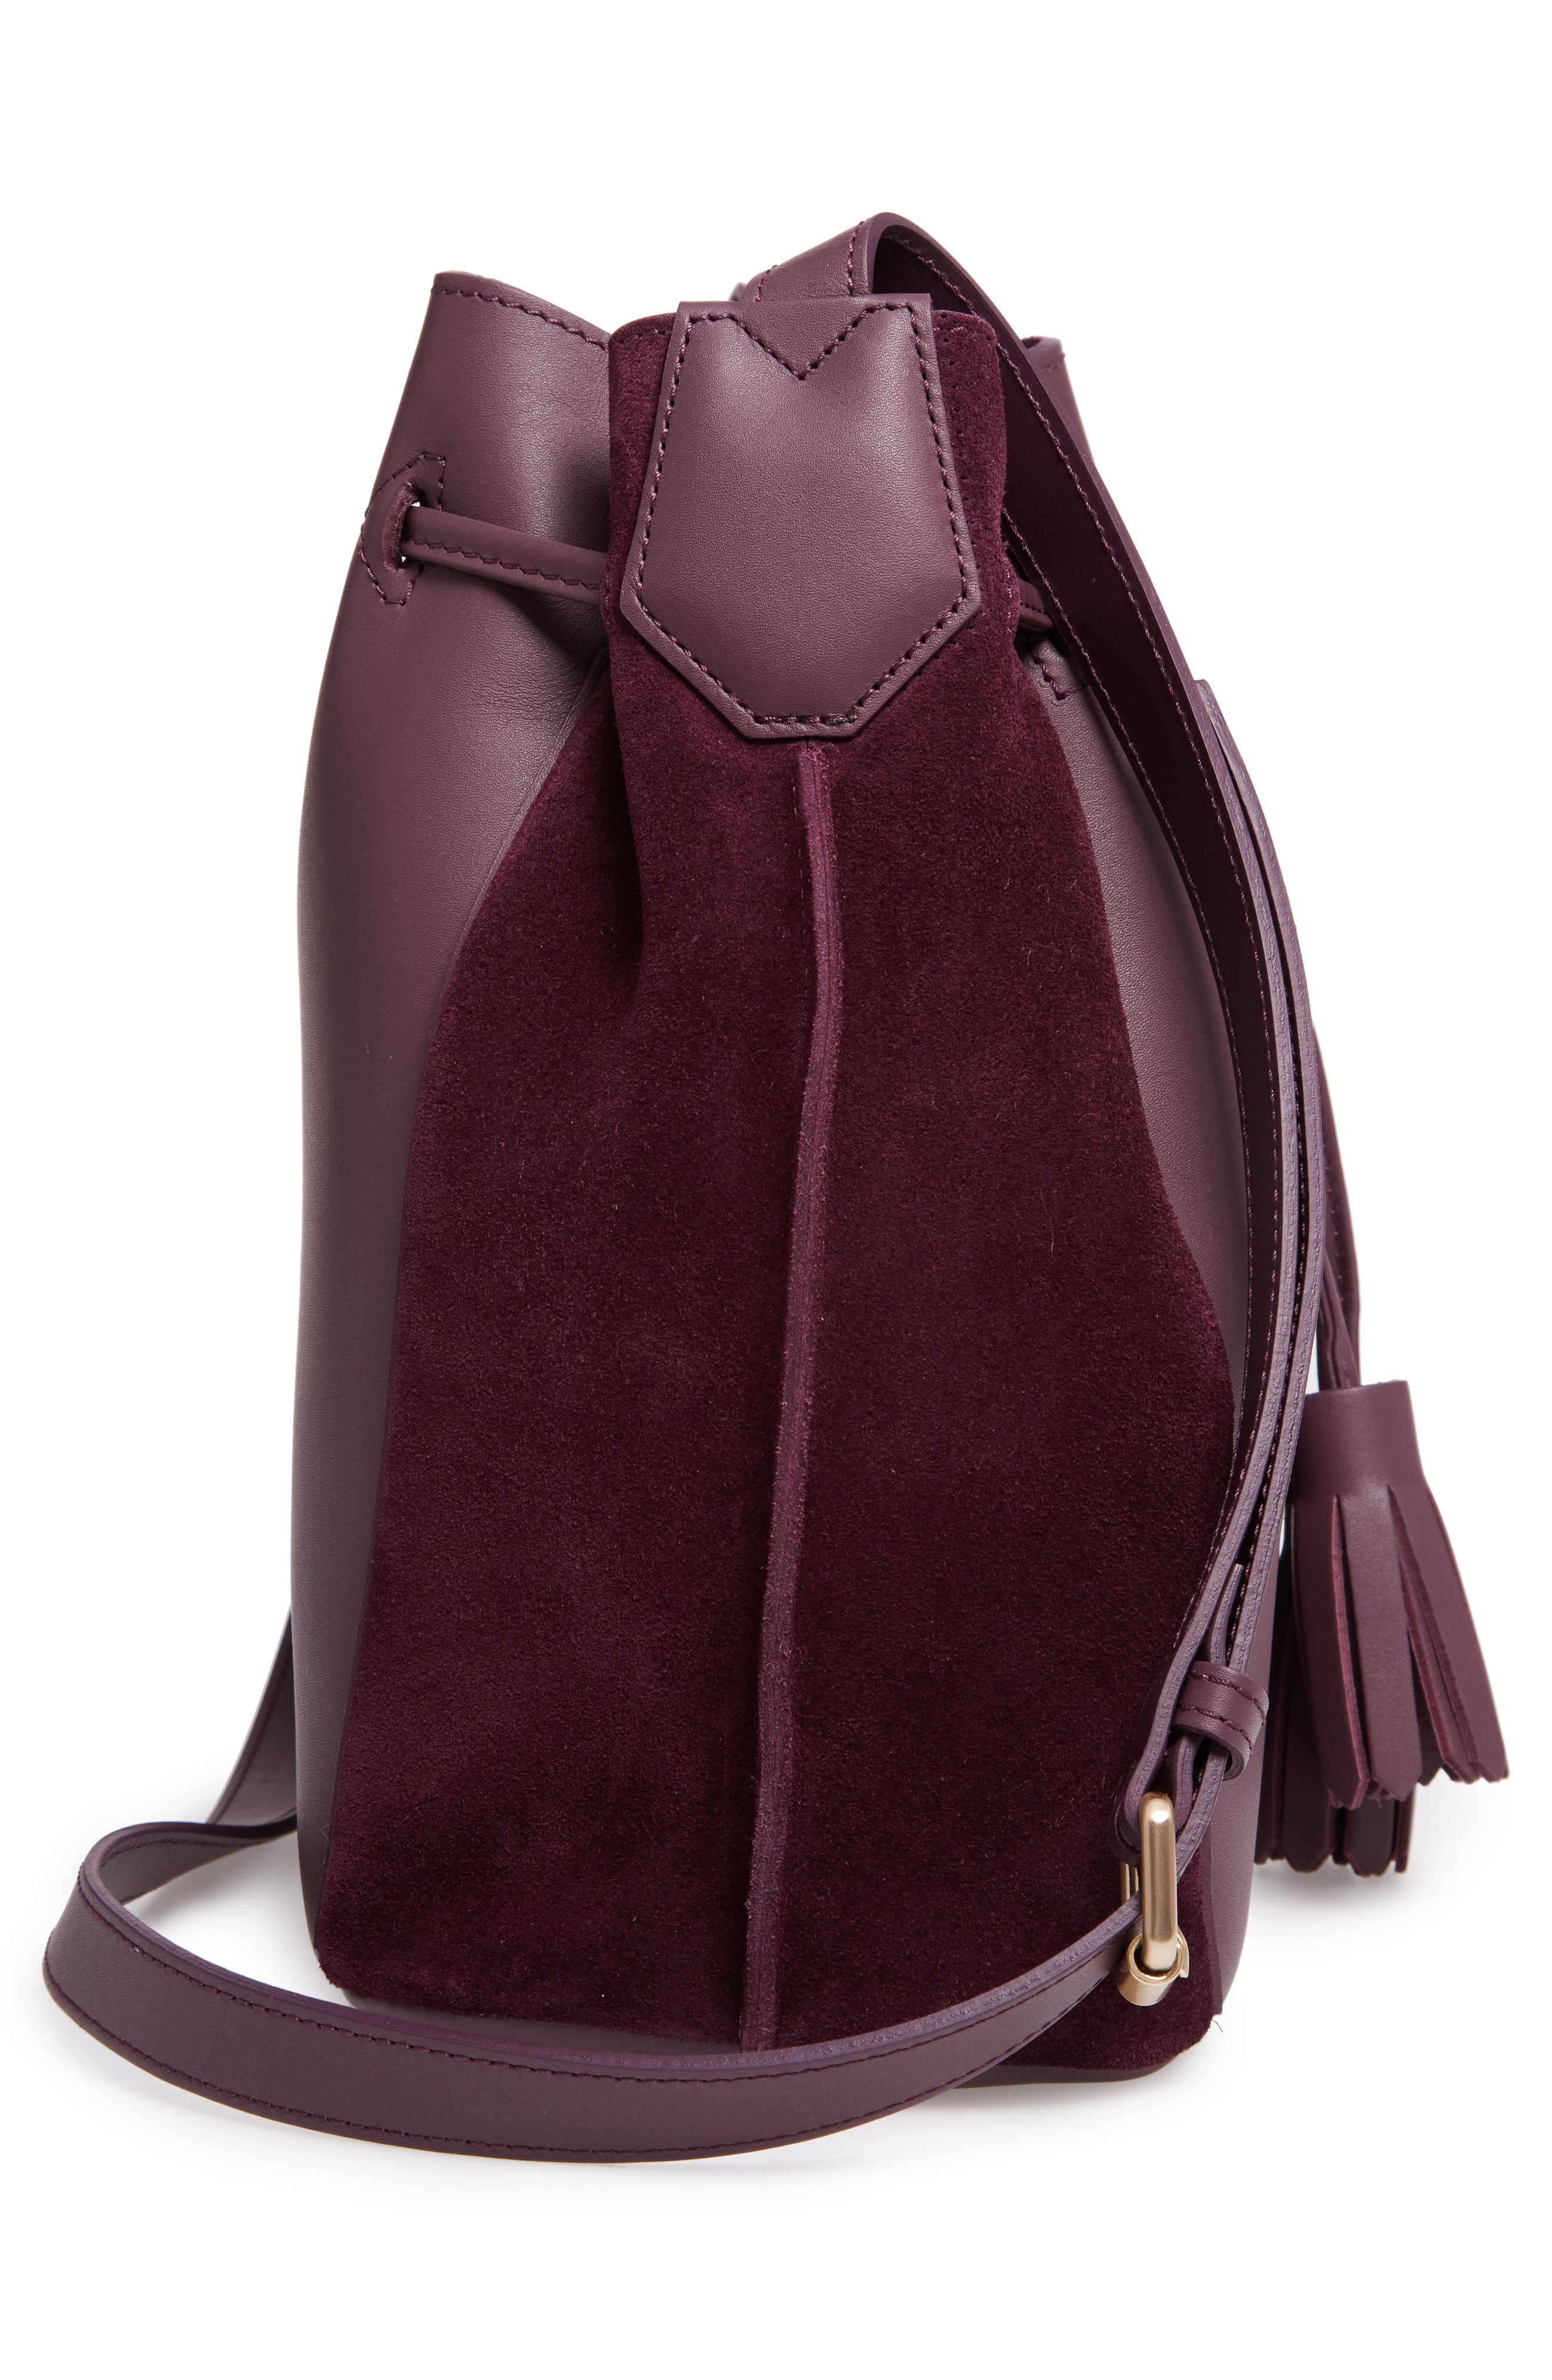 Penelope Fantasie Leather Bucket Bag,                             Alternate thumbnail 13, color,